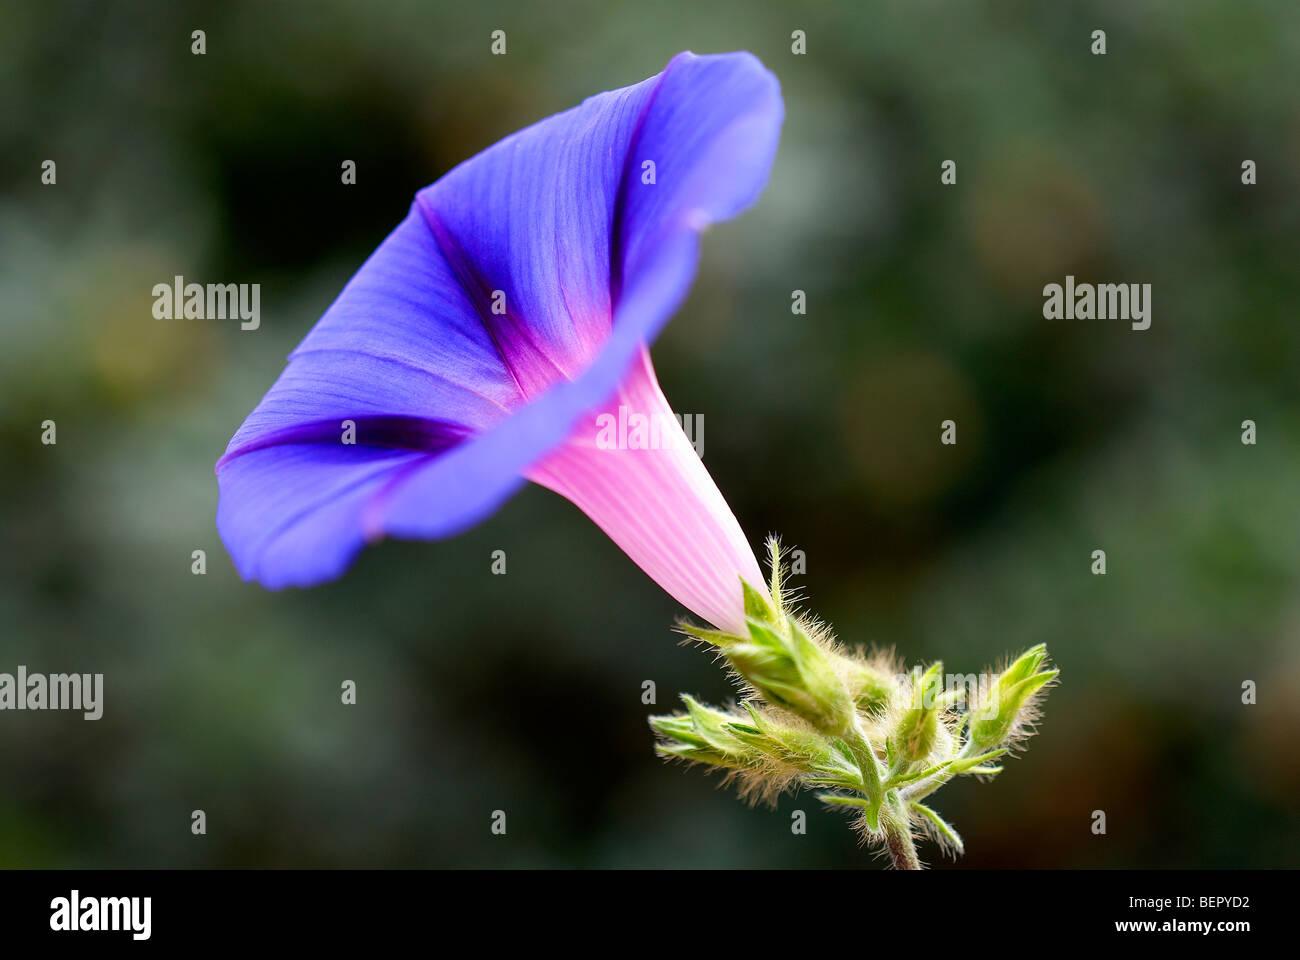 Morning glory, blue flower, royal blue, creeper, flower, flowers, close-up, close up, focus, macro, profile, white, - Stock Image